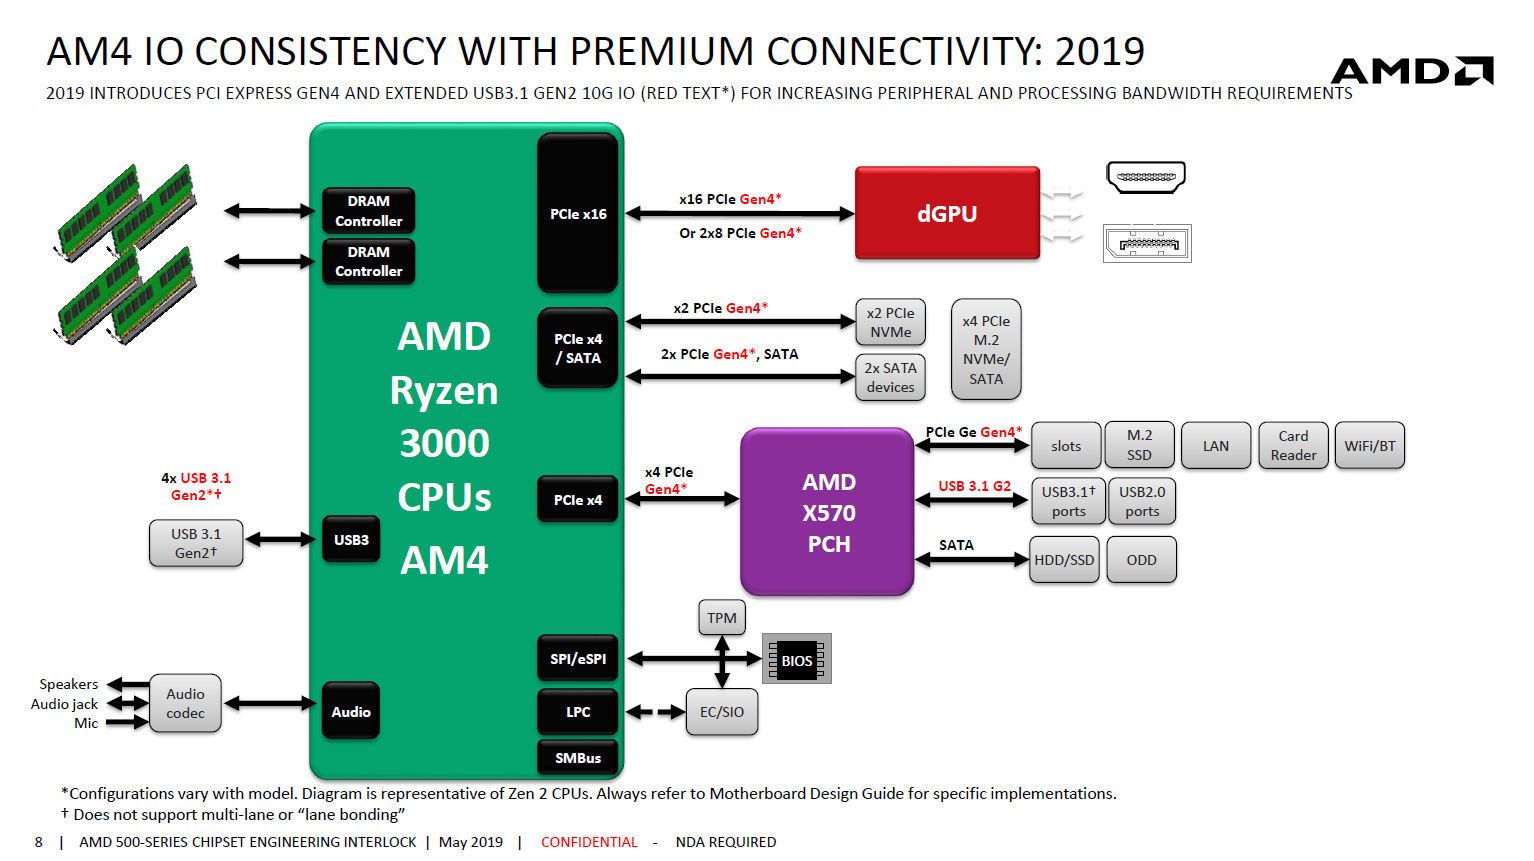 Amd X570 Unofficial Platform Diagram Revealed  Chipset Puts Out Pcie Gen 4